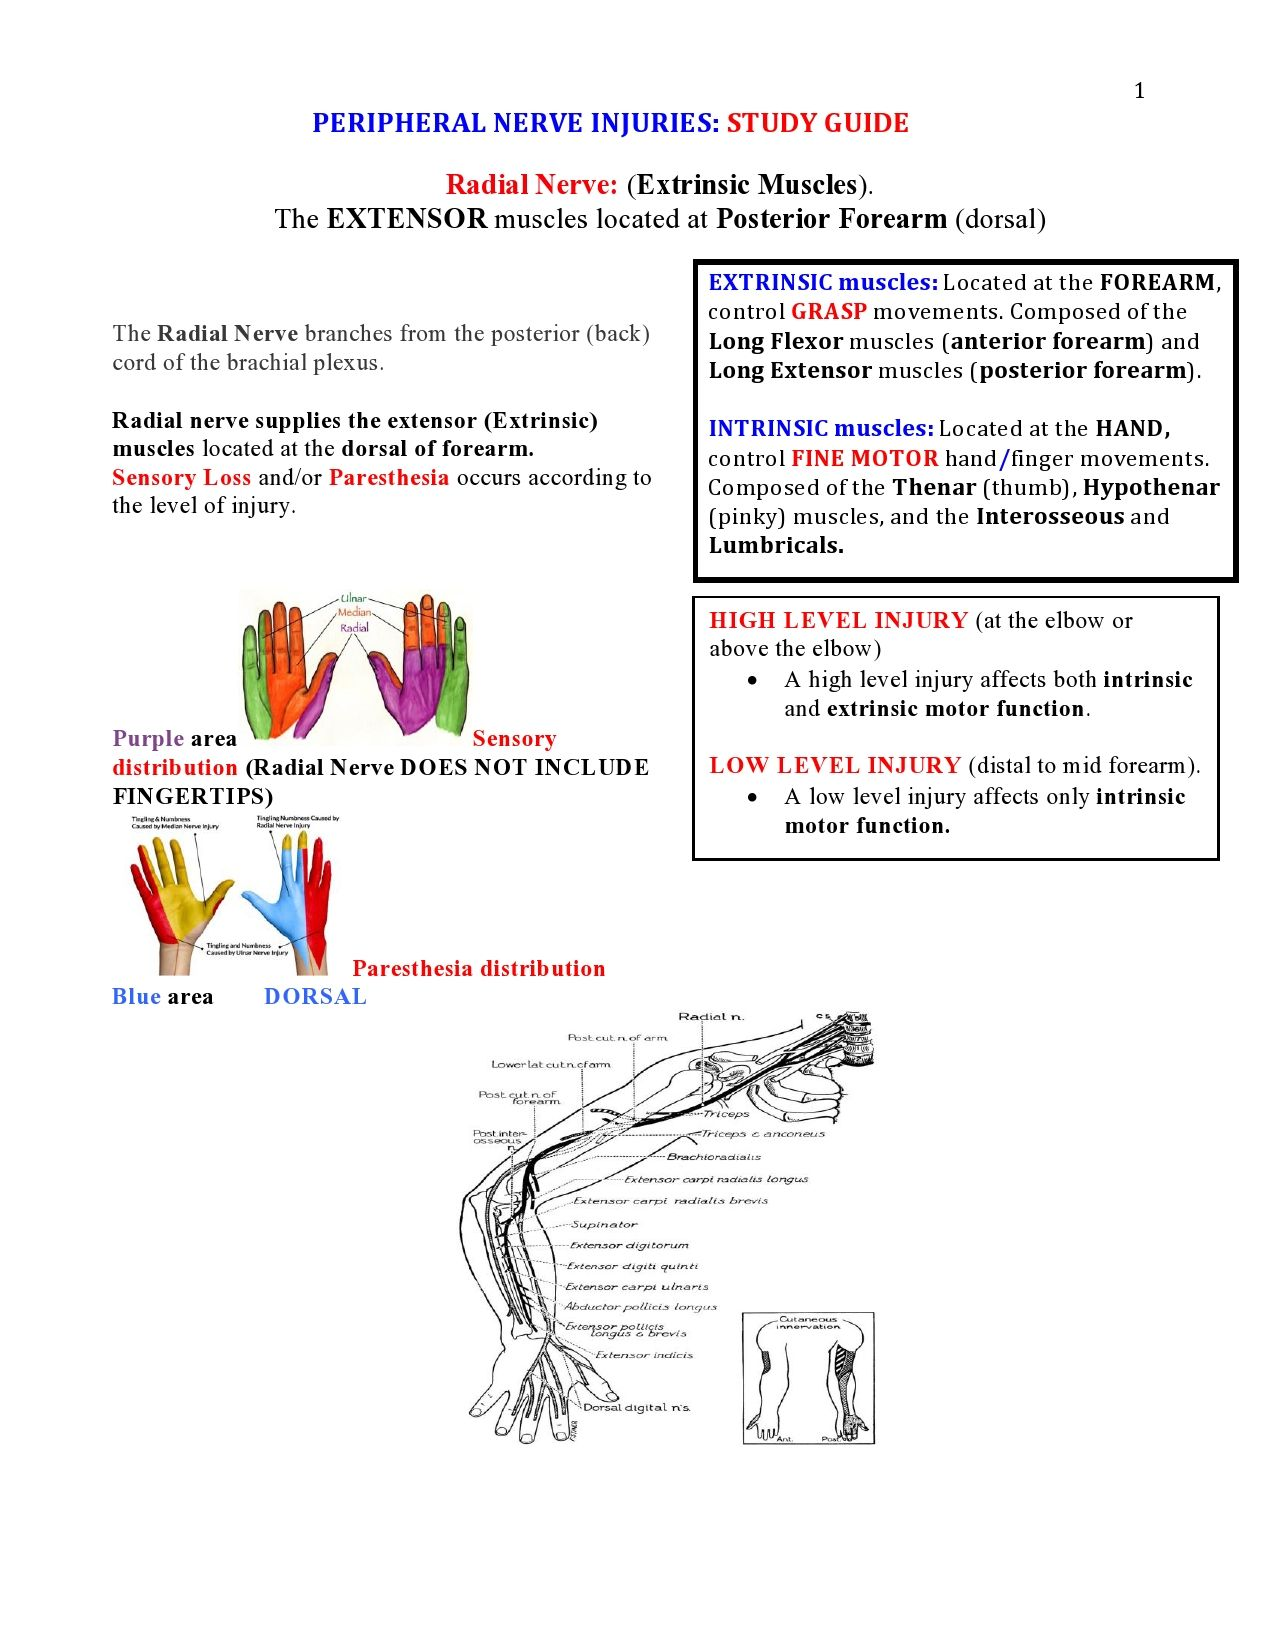 Best 25 Neuropathic Pain Ideas On Pinterest Manual Guide